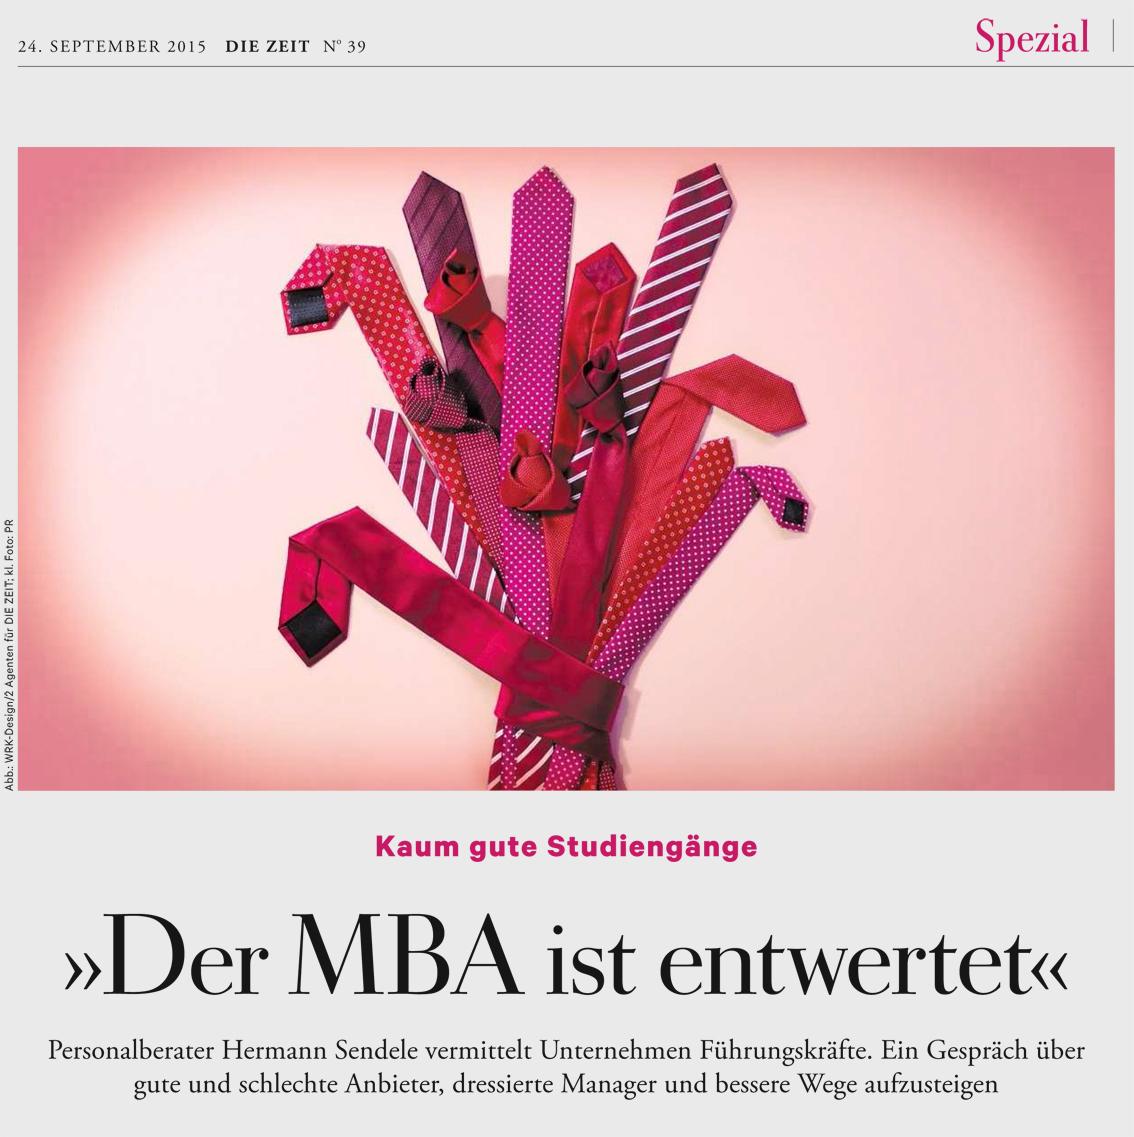 wrk_design_paperart_tactile_illustrations_Zeit_Zeitung_Papercraft 2.jpg